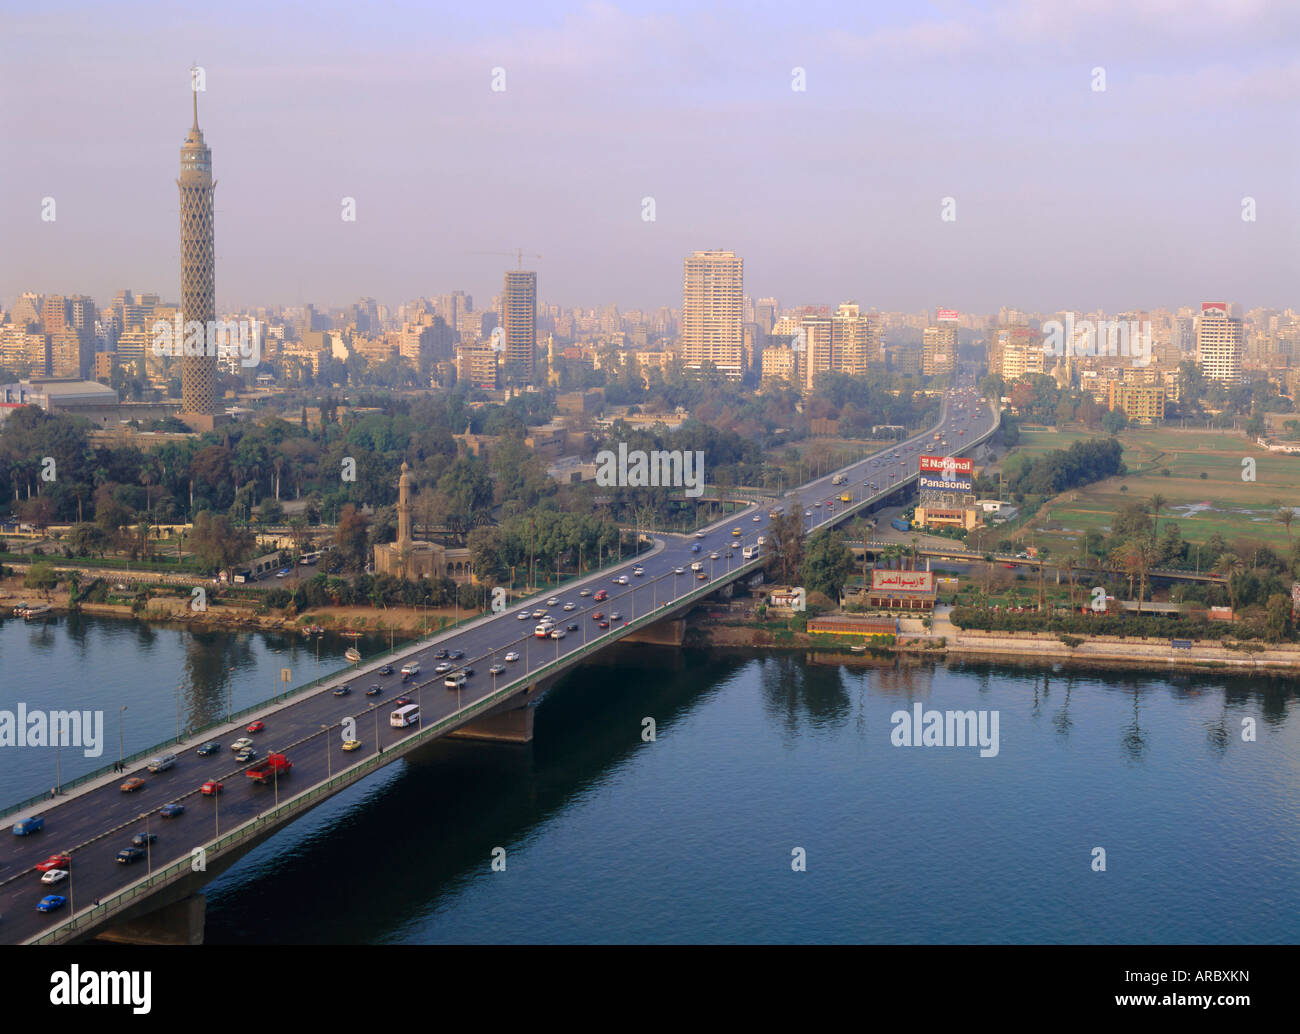 6th October Bridge Cairo Egypt